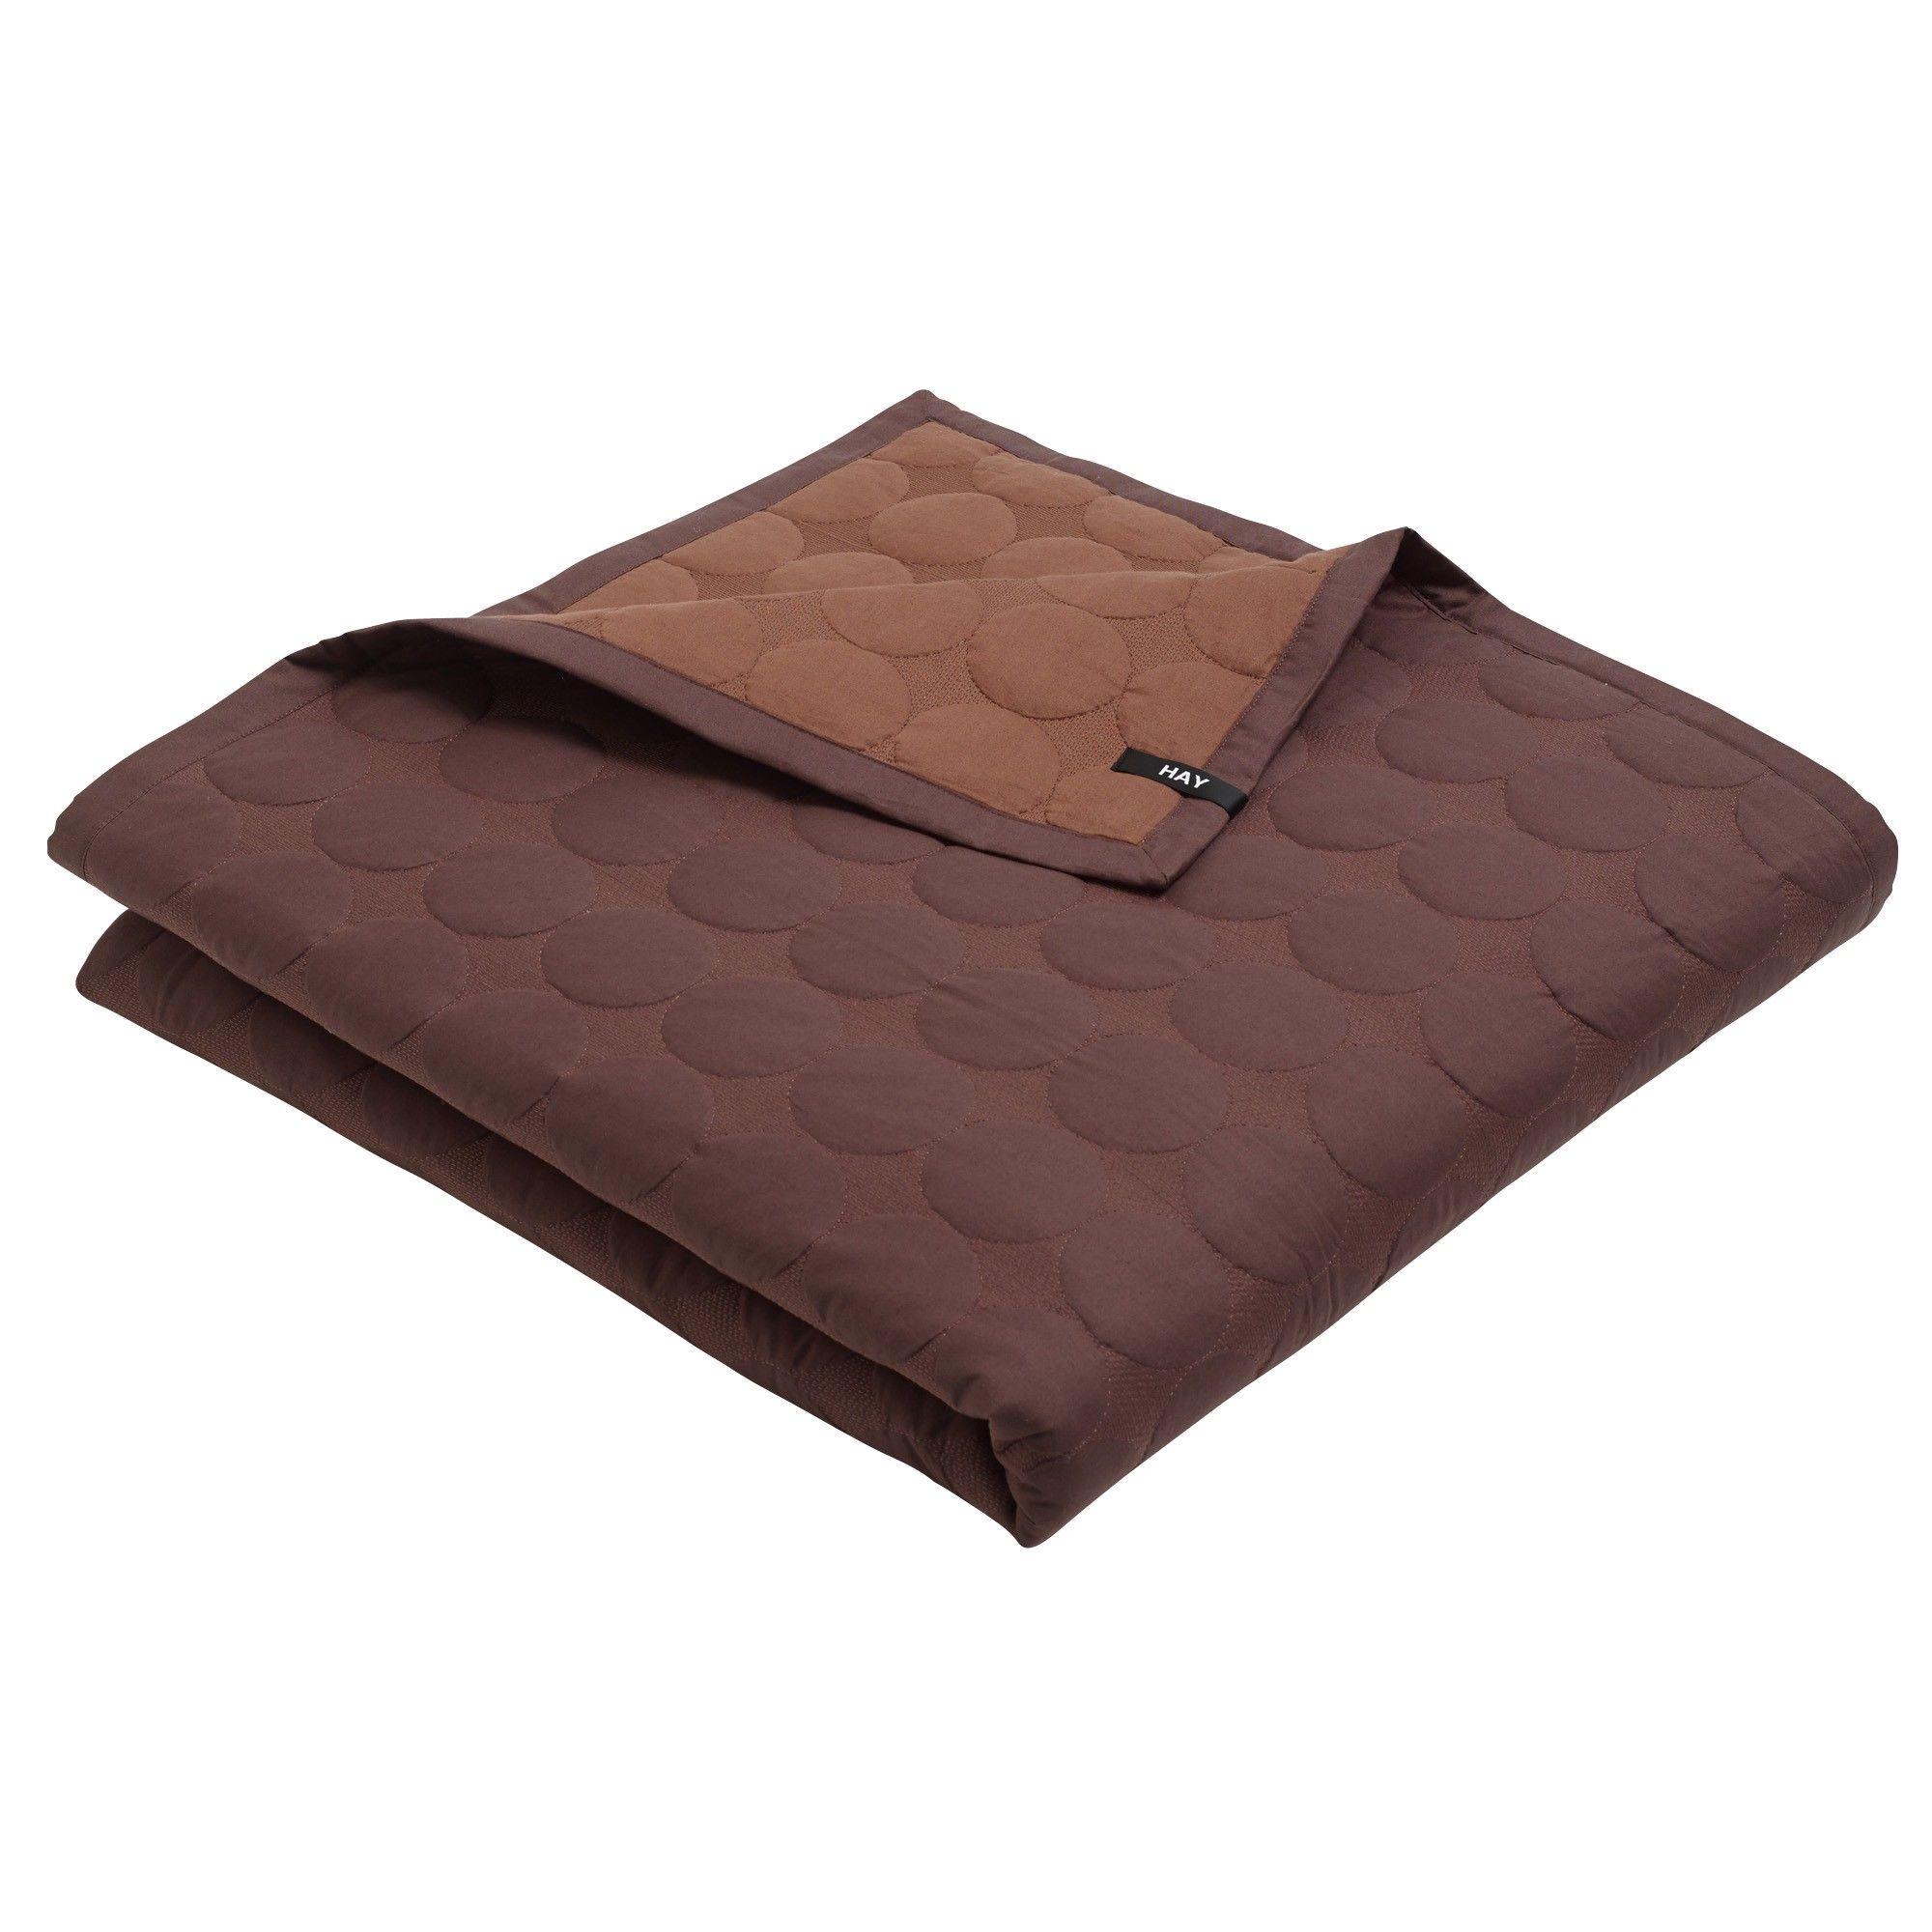 couvre lit hay Couvre lit MEGA DOT rust   HAY | Bed linen | Pinterest | Rust, Bed  couvre lit hay